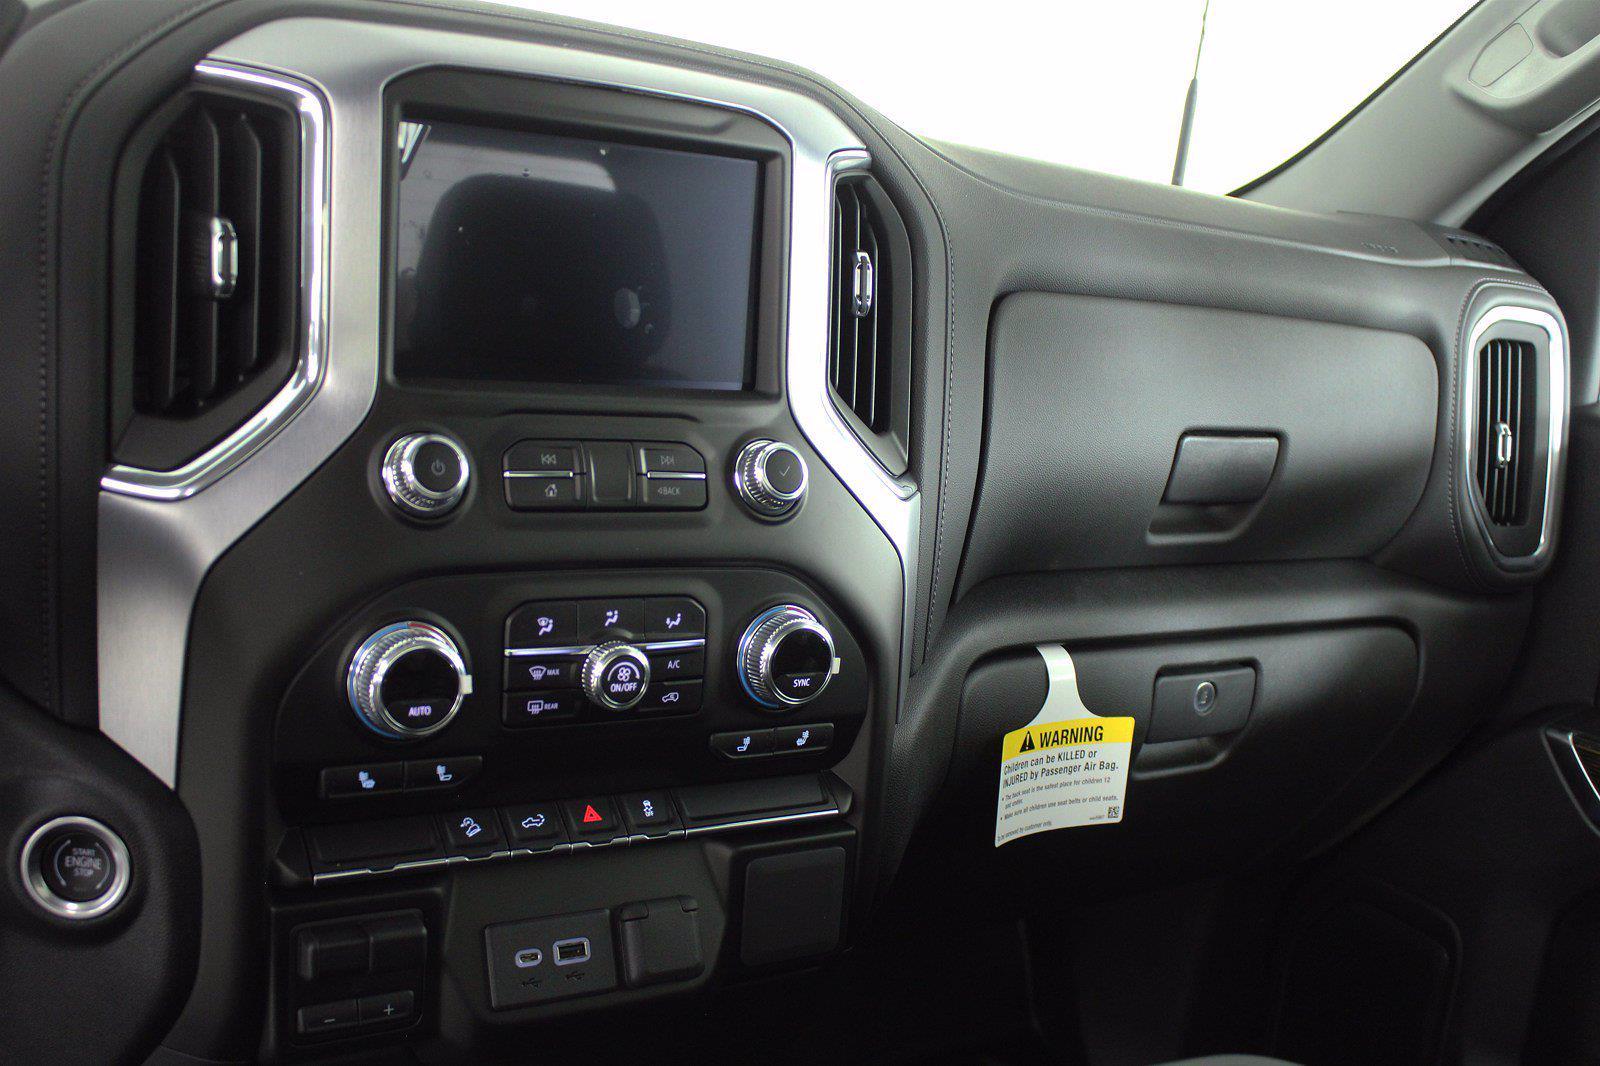 2022 Sierra 2500 Regular Cab 4x4,  Pickup #D420037 - photo 12